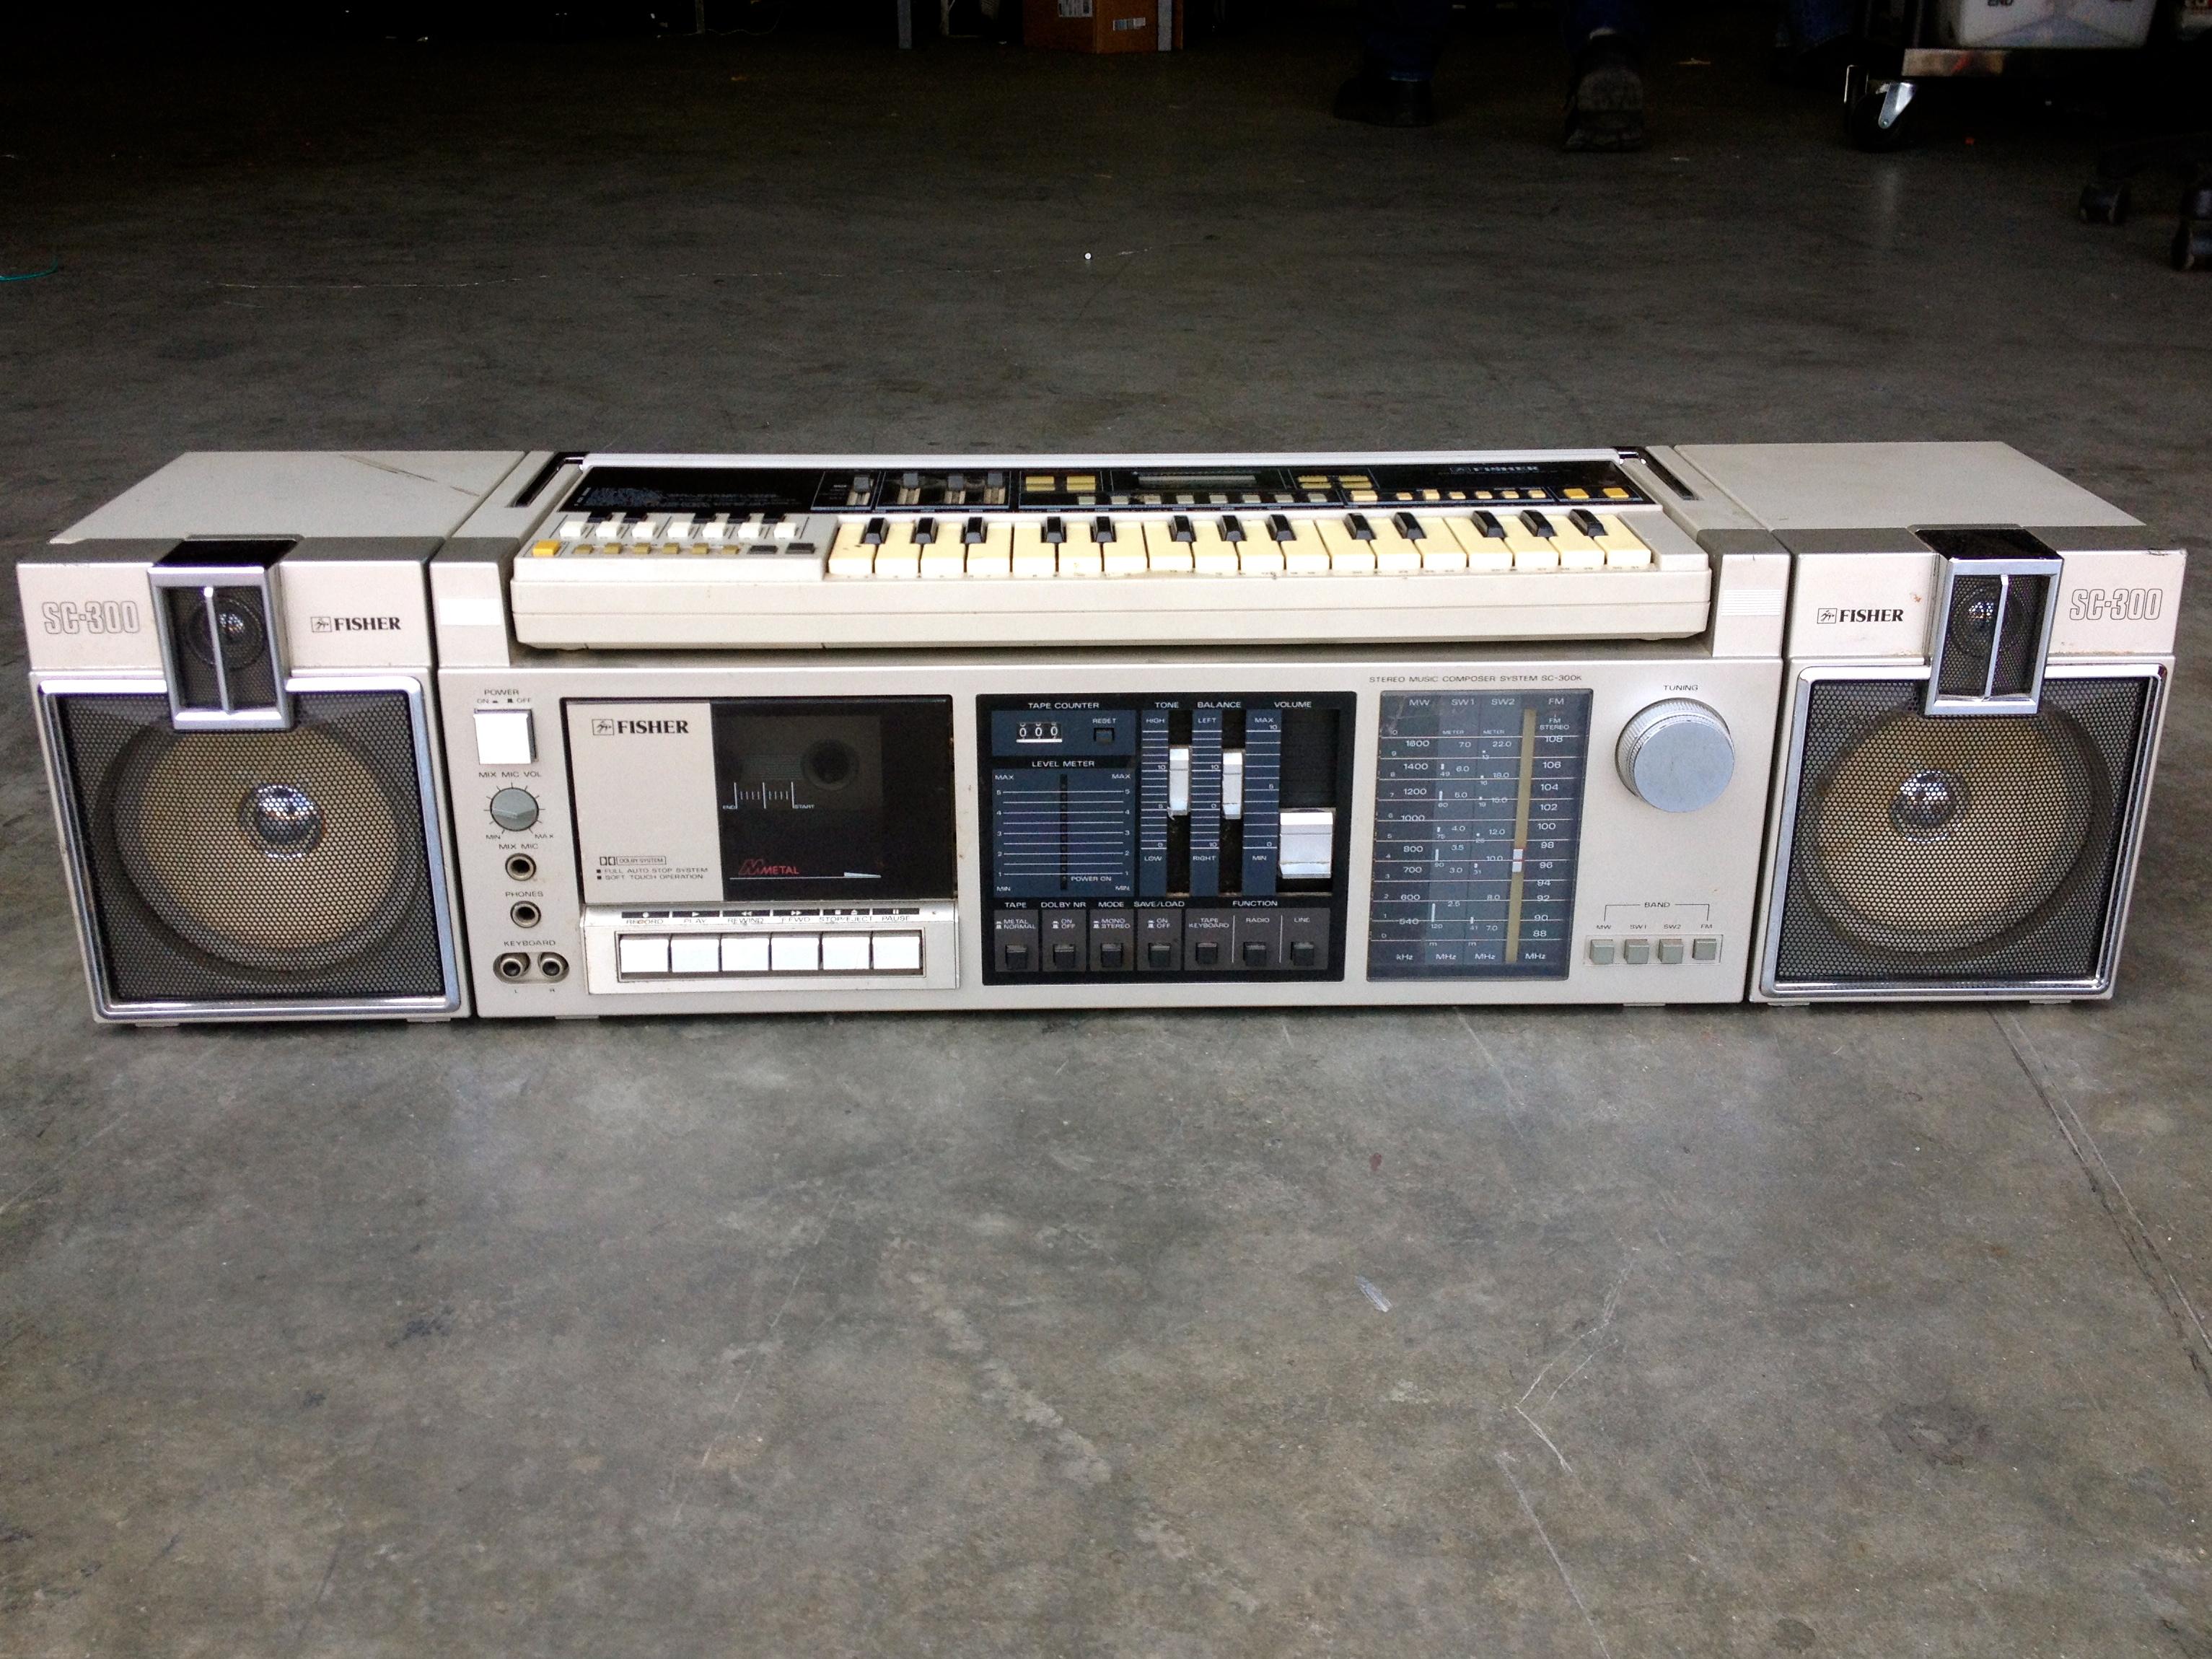 keyboard_boombox.JPG